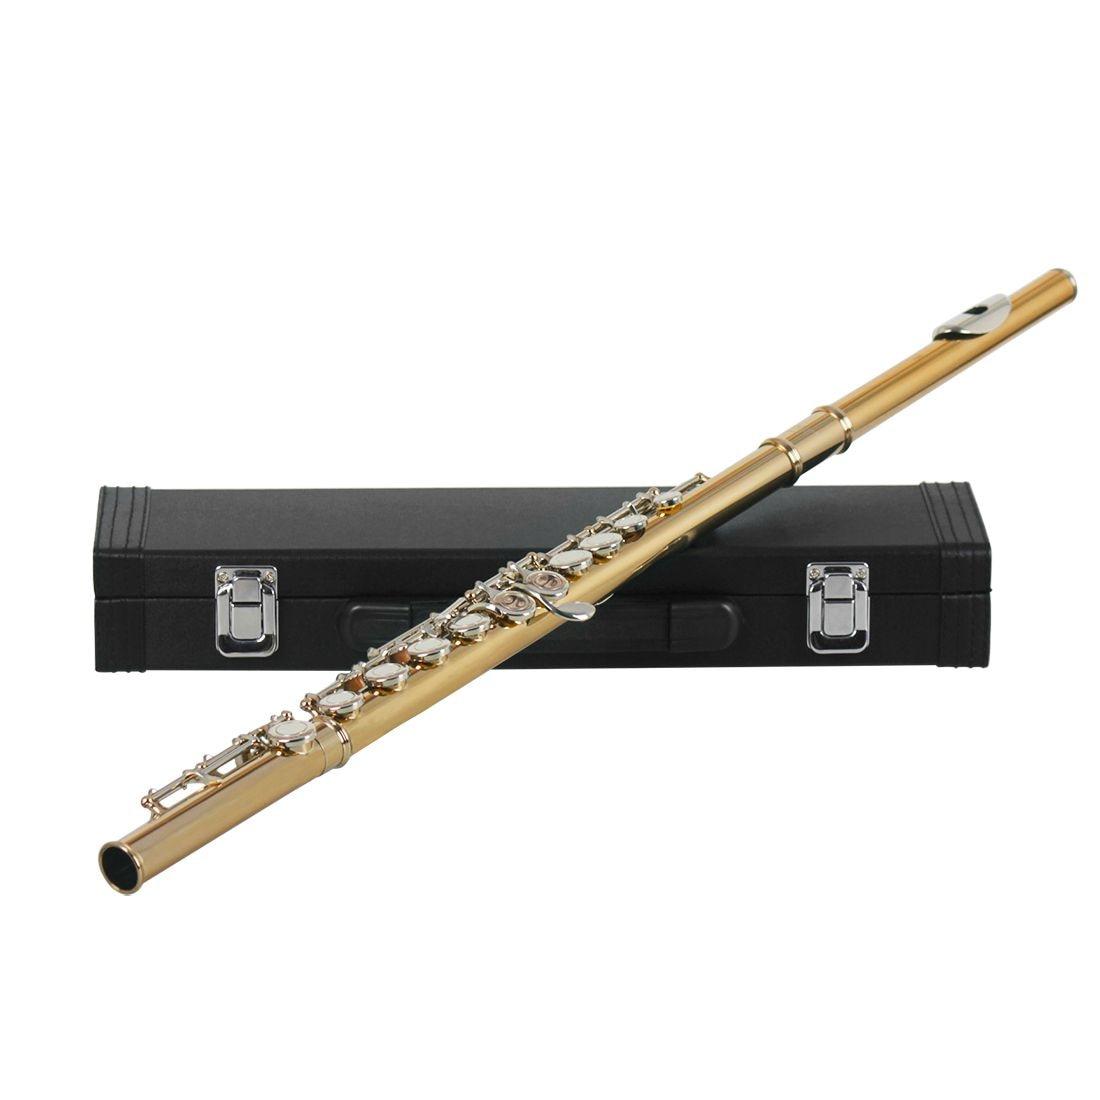 купить HOT-Western Concert Flute 16 Holes C Key Cupronickel Musical Instrument with Cleaning Cloth Stick Gloves Screwdriver Gold по цене 4971.3 рублей